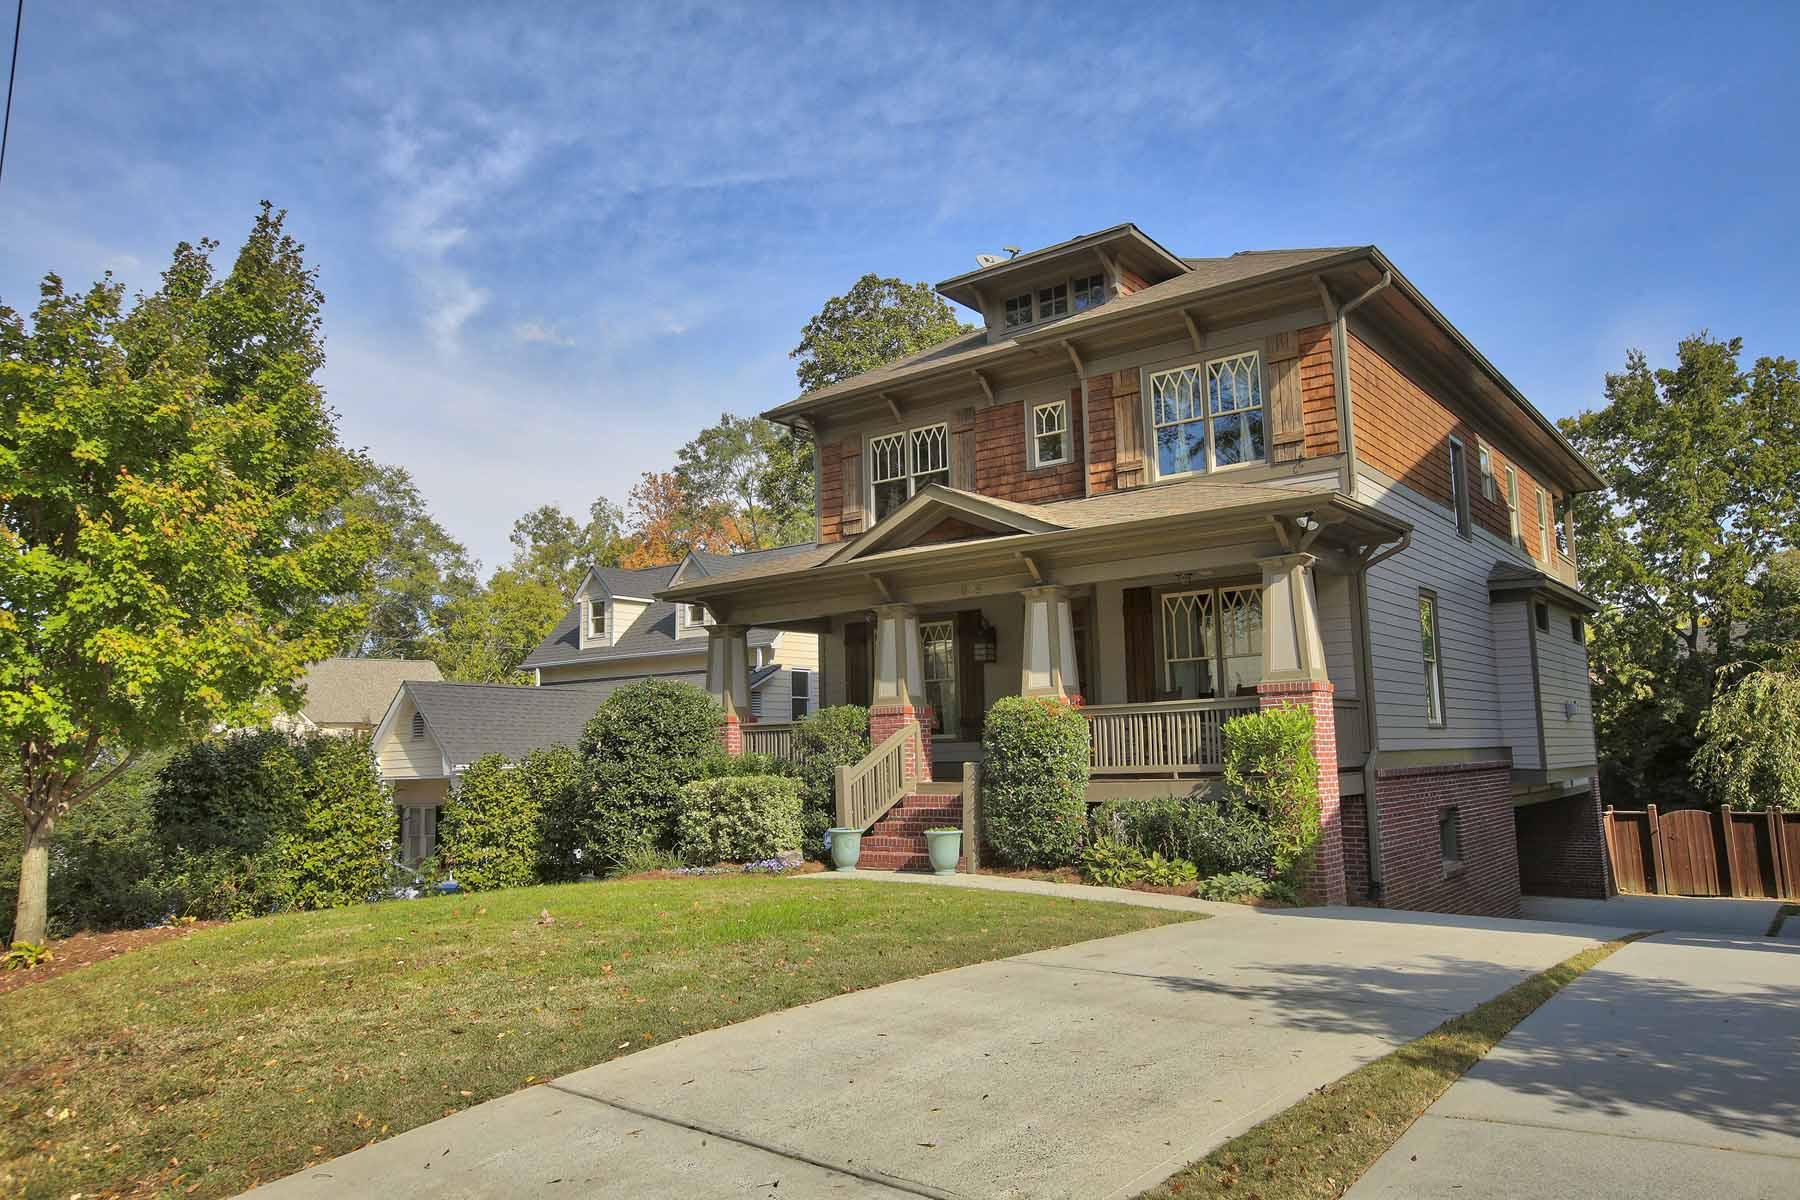 Casa para uma família para Venda às Elegant Craftsman Home Steps from Shops & Restaurants in Brookhaven 2629 Apple Valley Road Atlanta, Geórgia, 30319 Estados Unidos